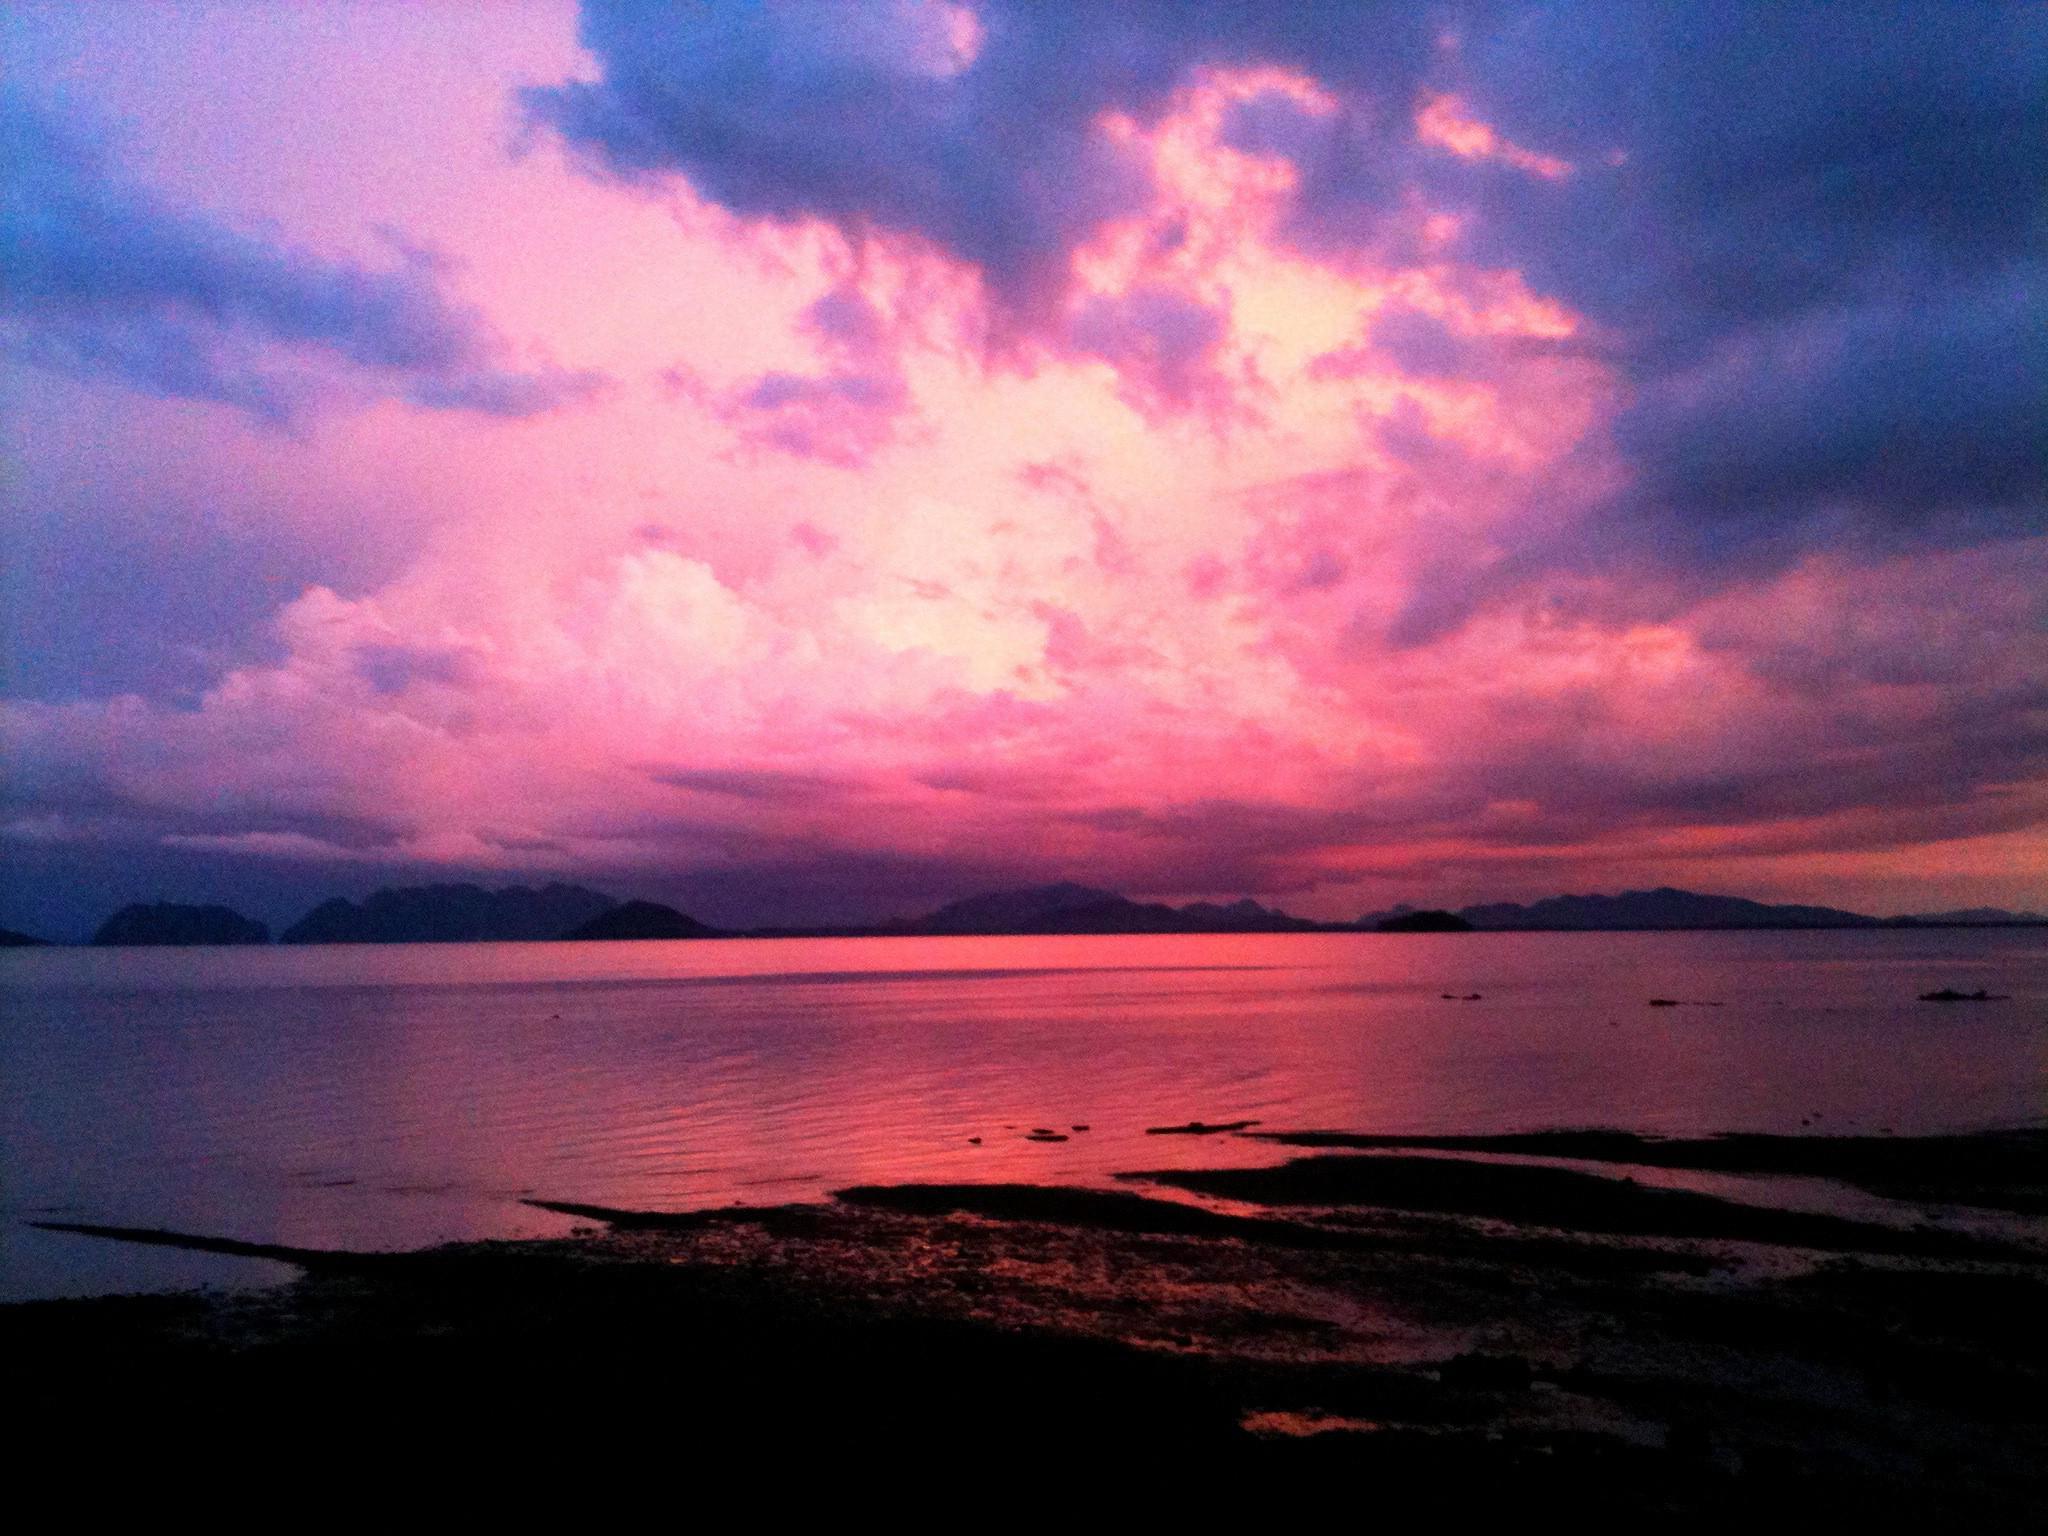 HD Pink Sunset HD Wallpaper Download   140429 2048x1536